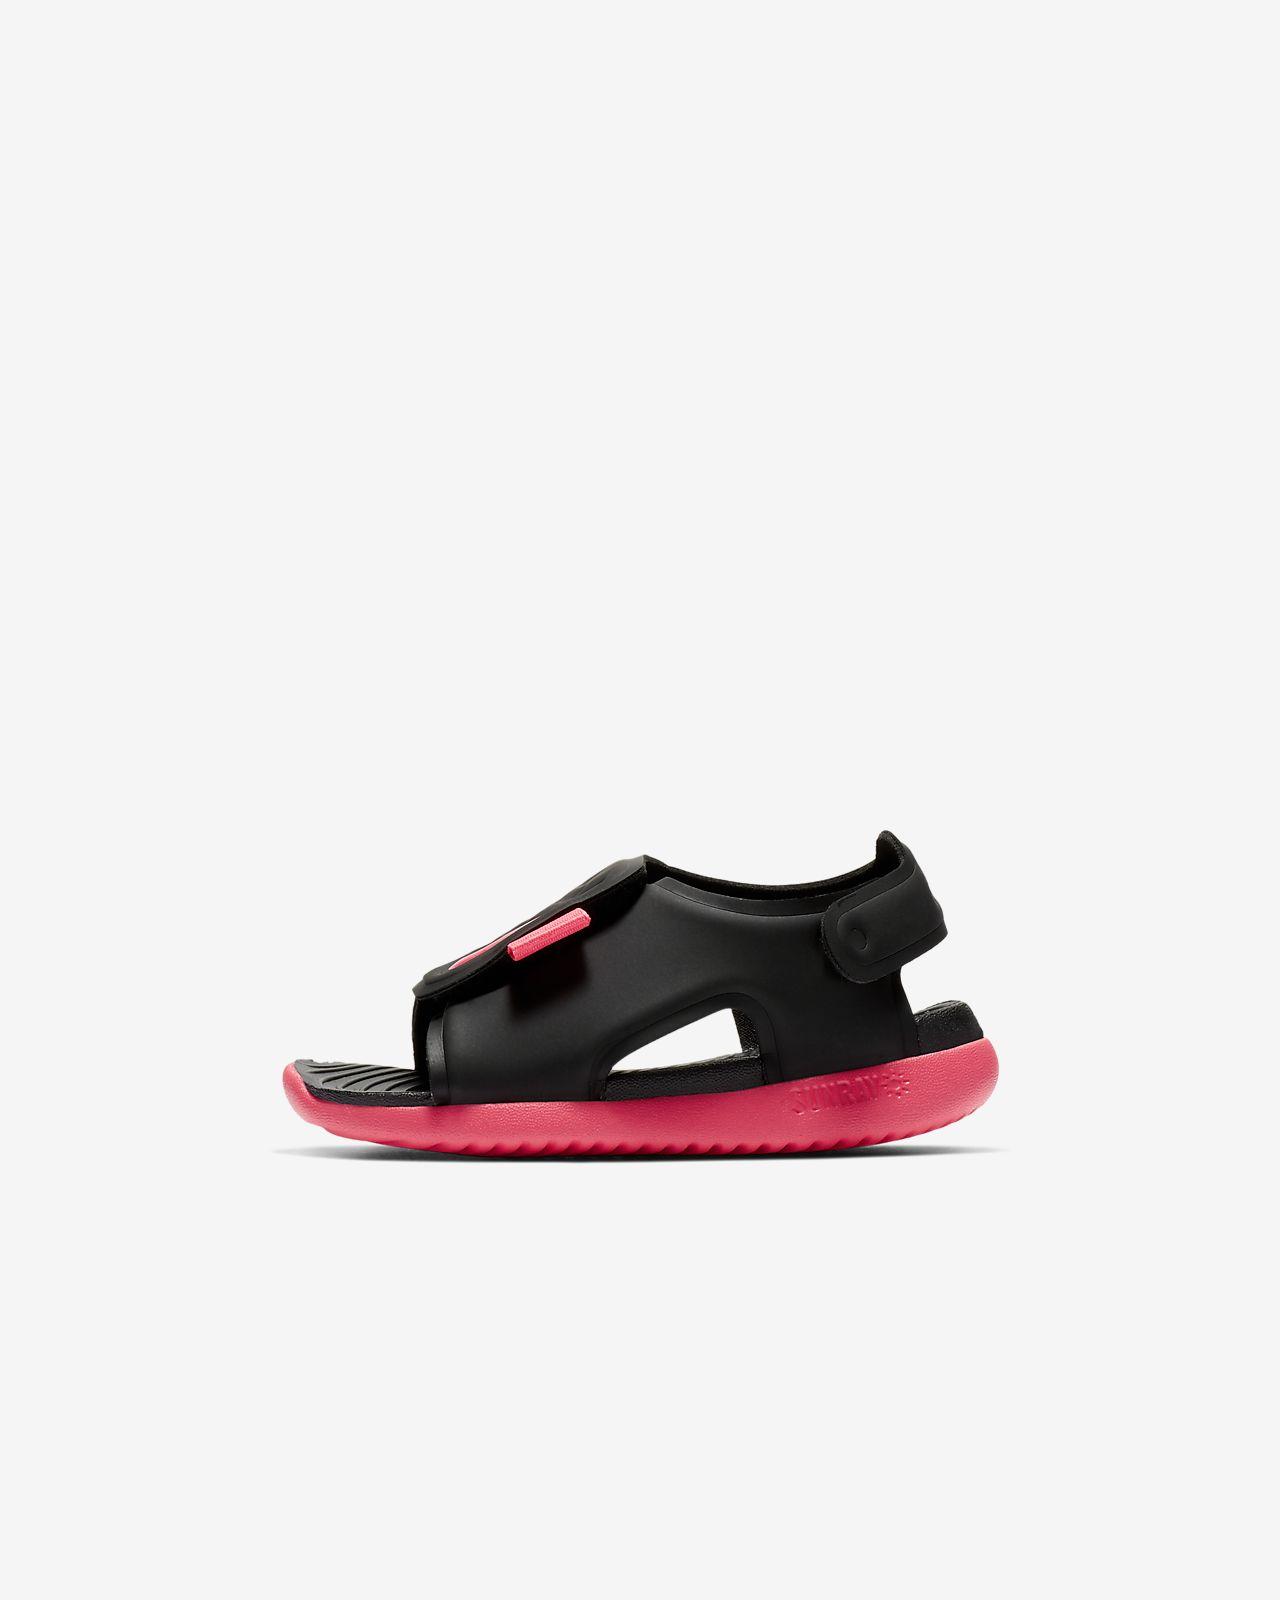 Nike Sunray Adjust 5 (TD) 婴童凉鞋